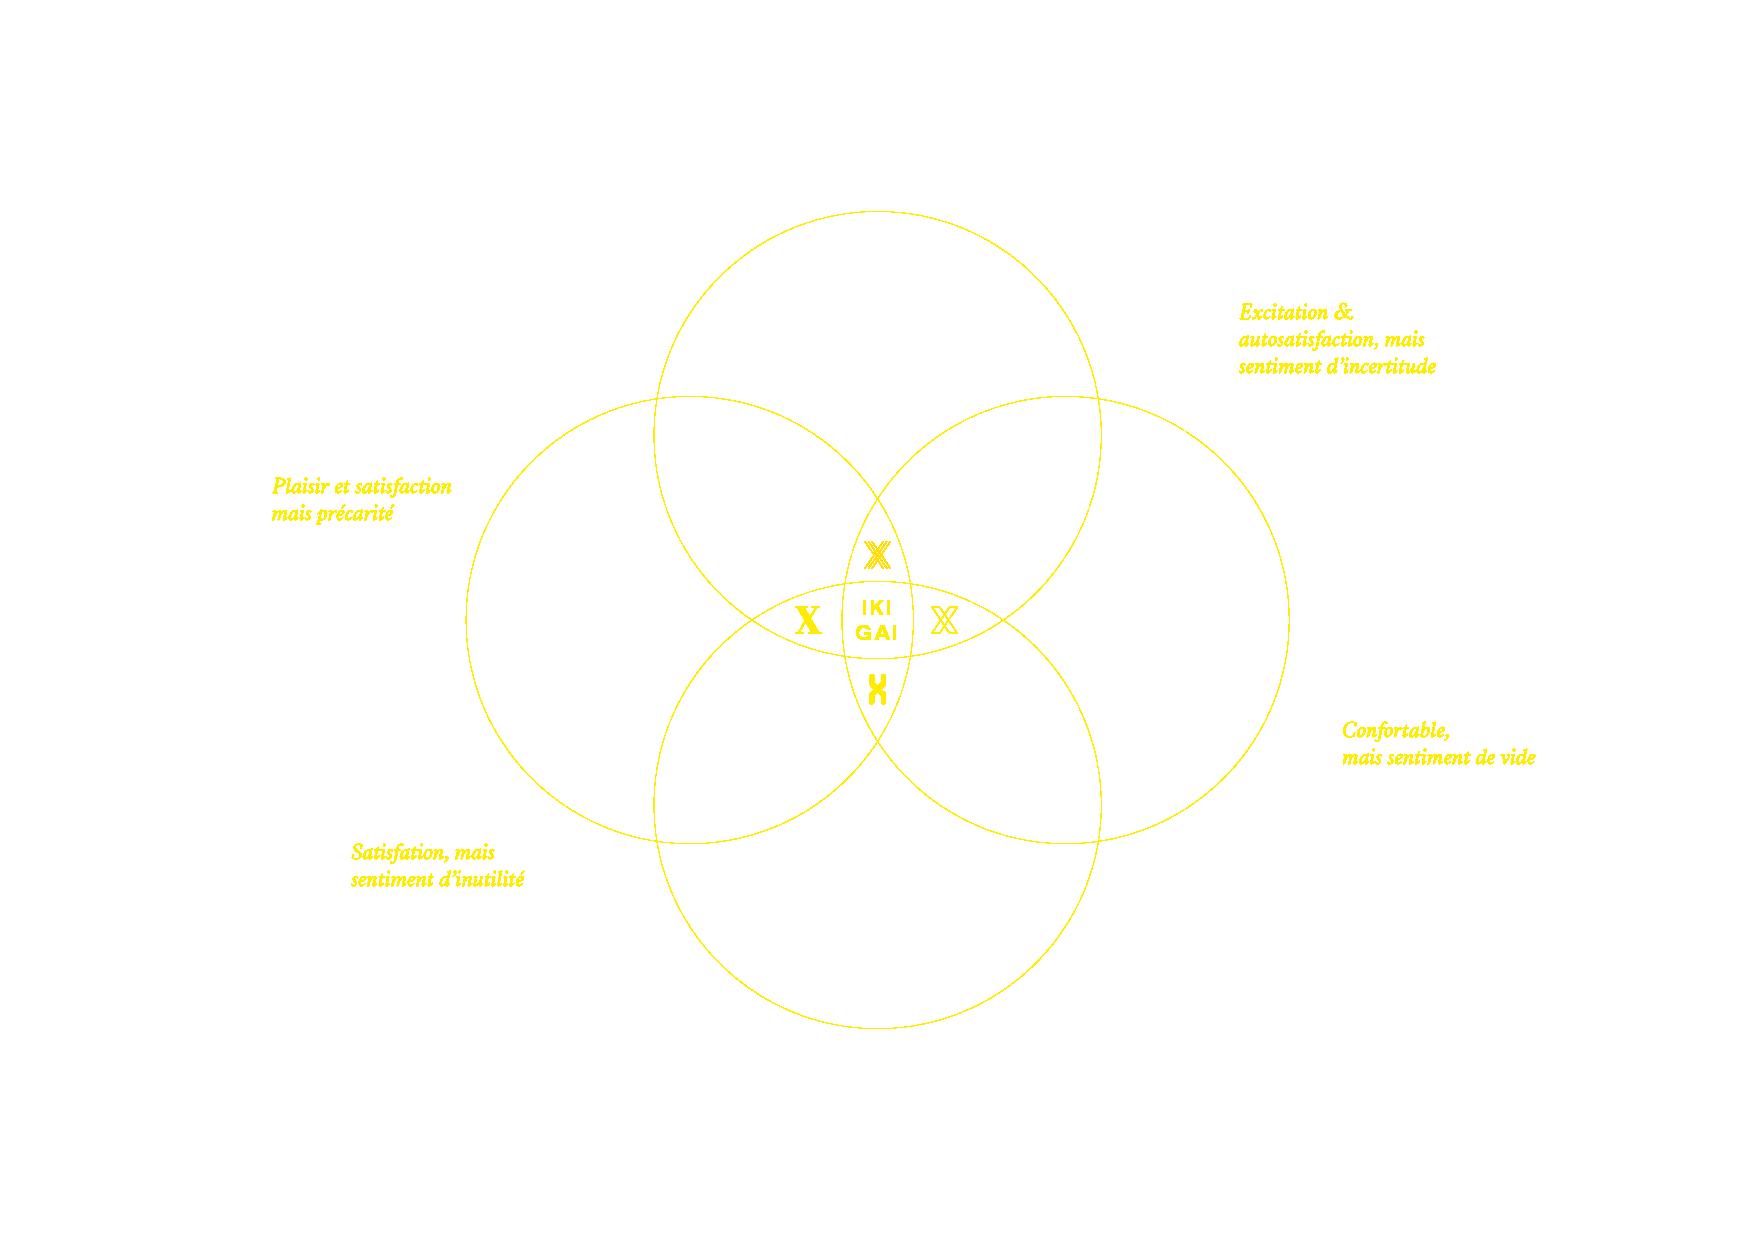 schema-ikigai.png